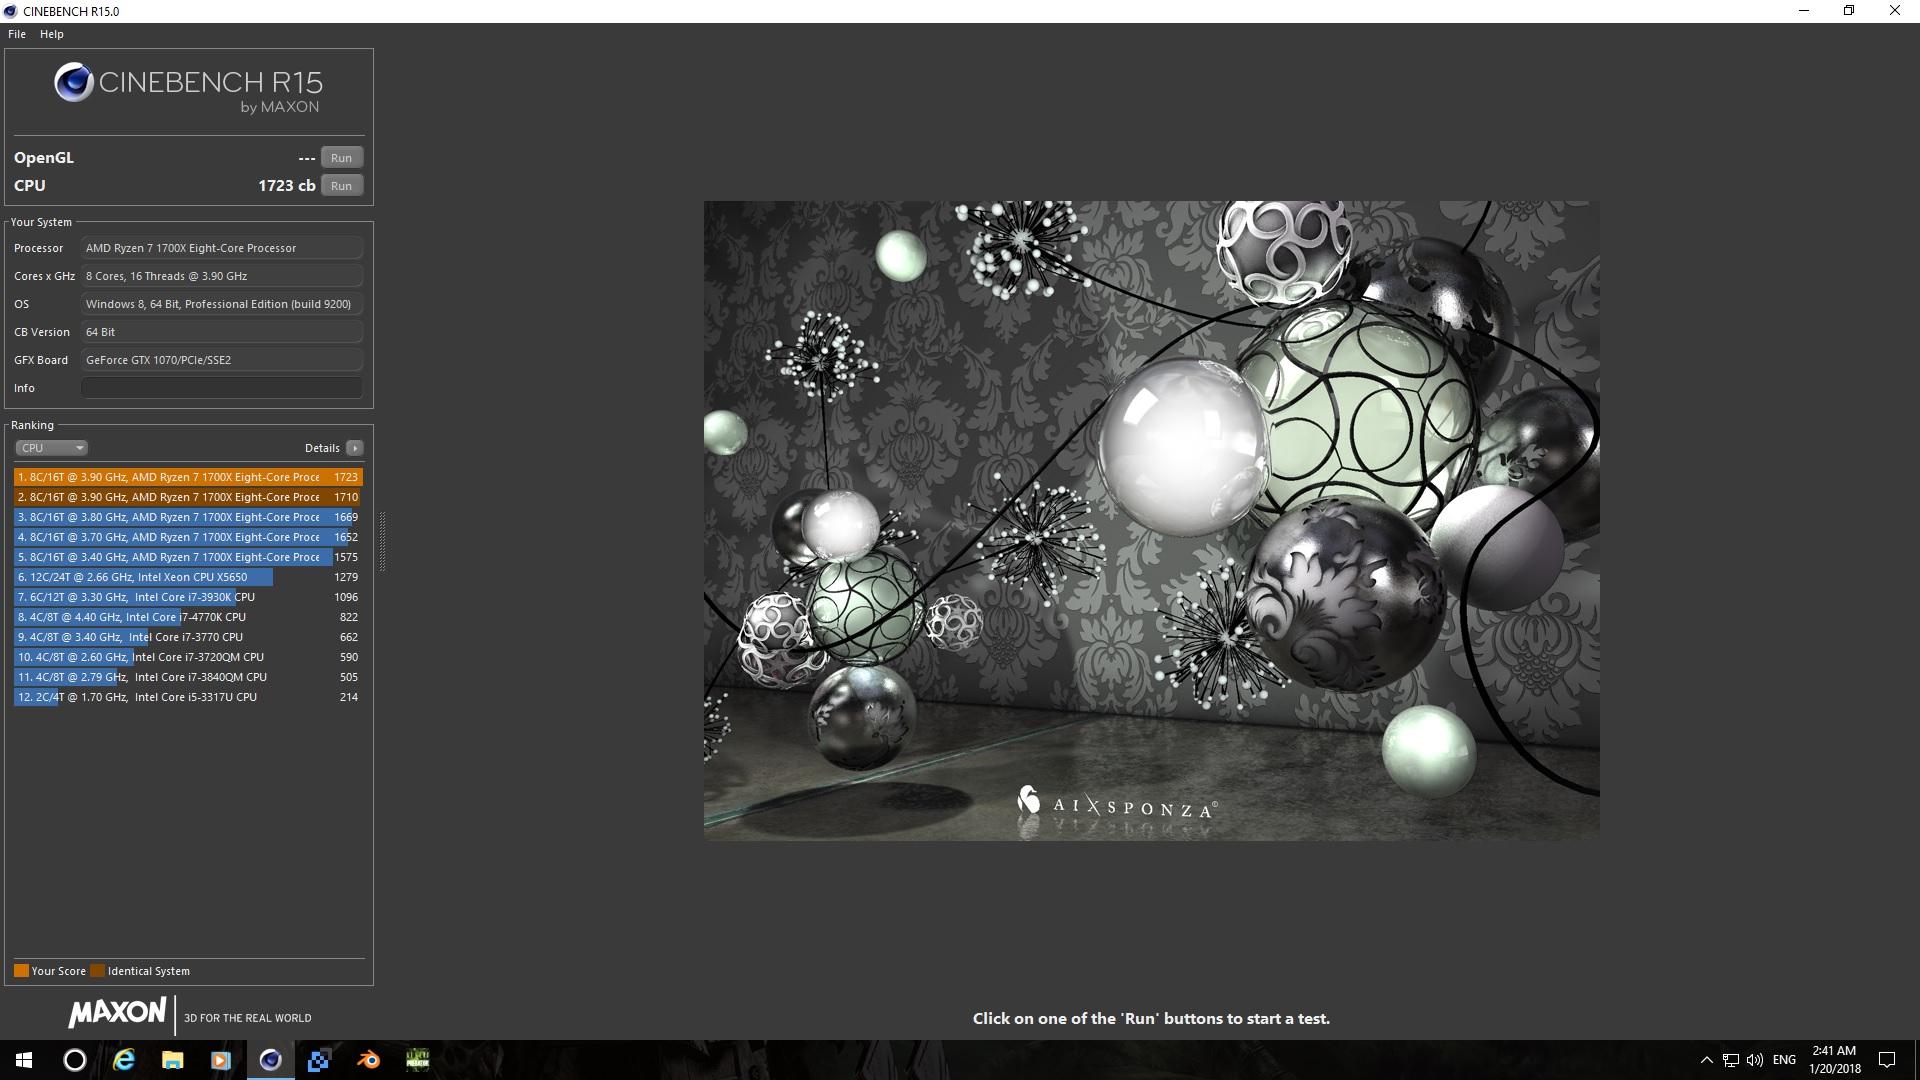 Ryzen 7 1700X 3.9GHz Cinebench R15 score #2.jpg